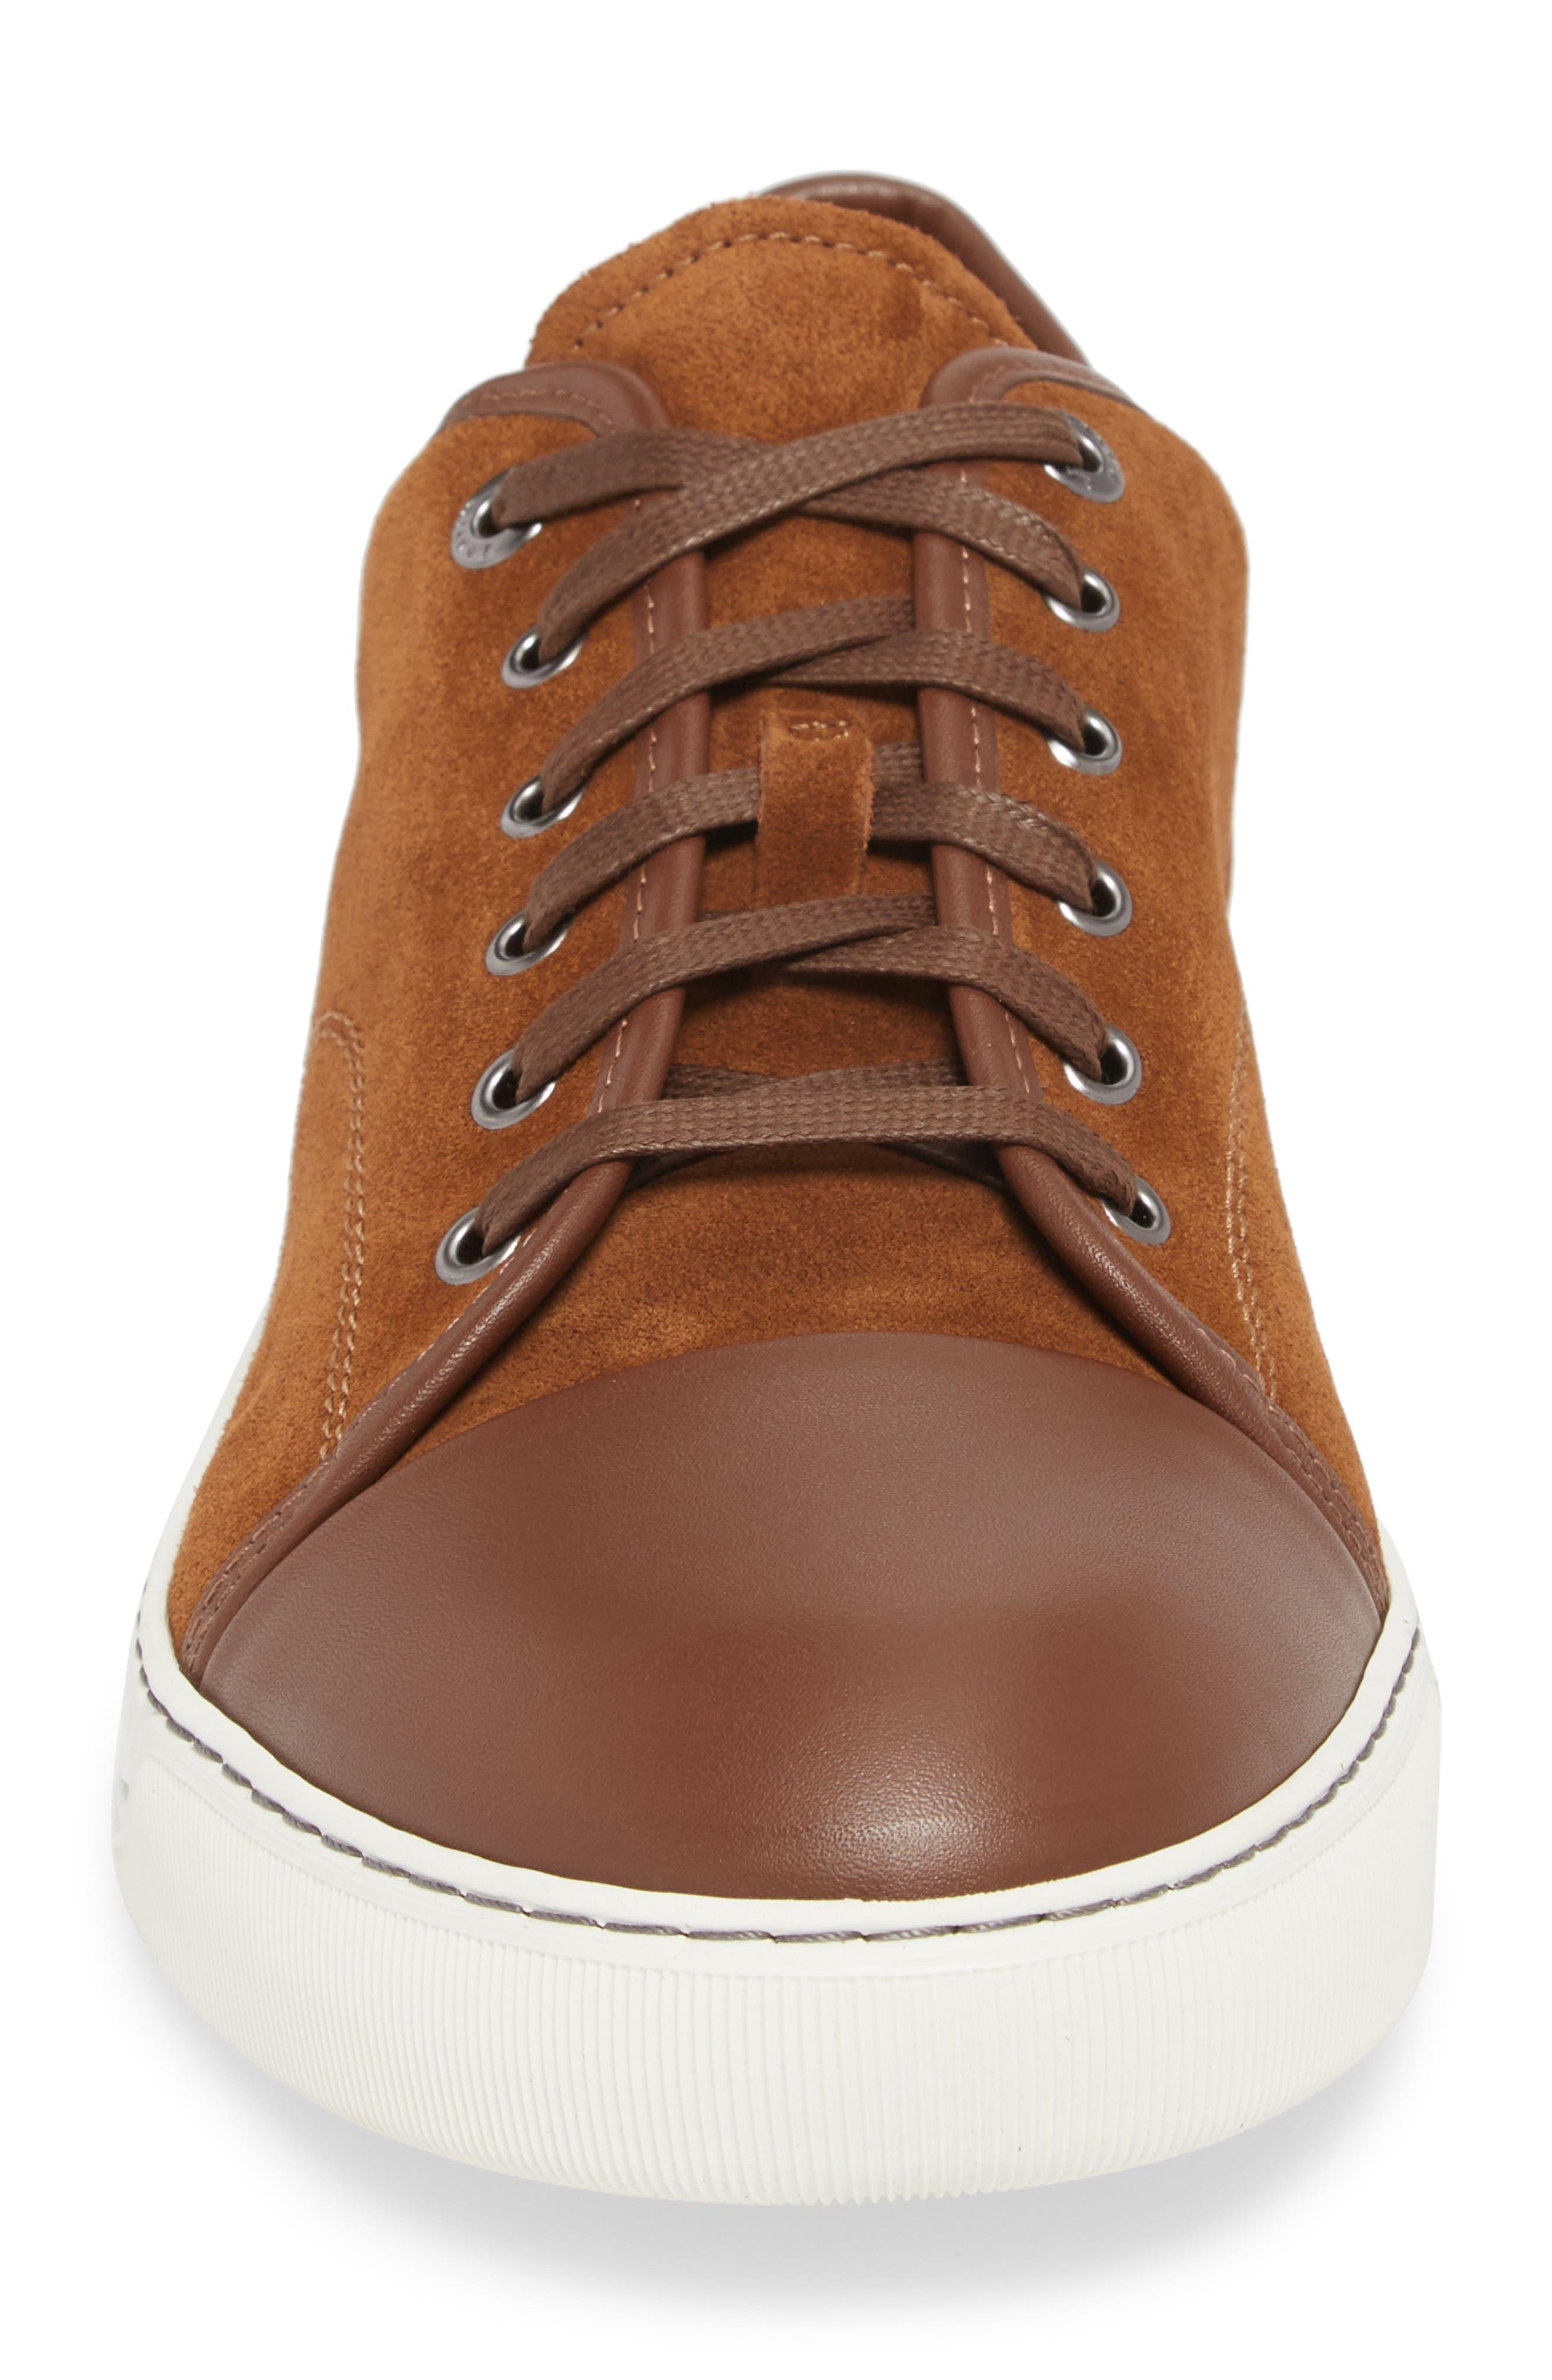 Low Top Sneaker,                             Alternate thumbnail 4, color,                             LIGHT BROWN